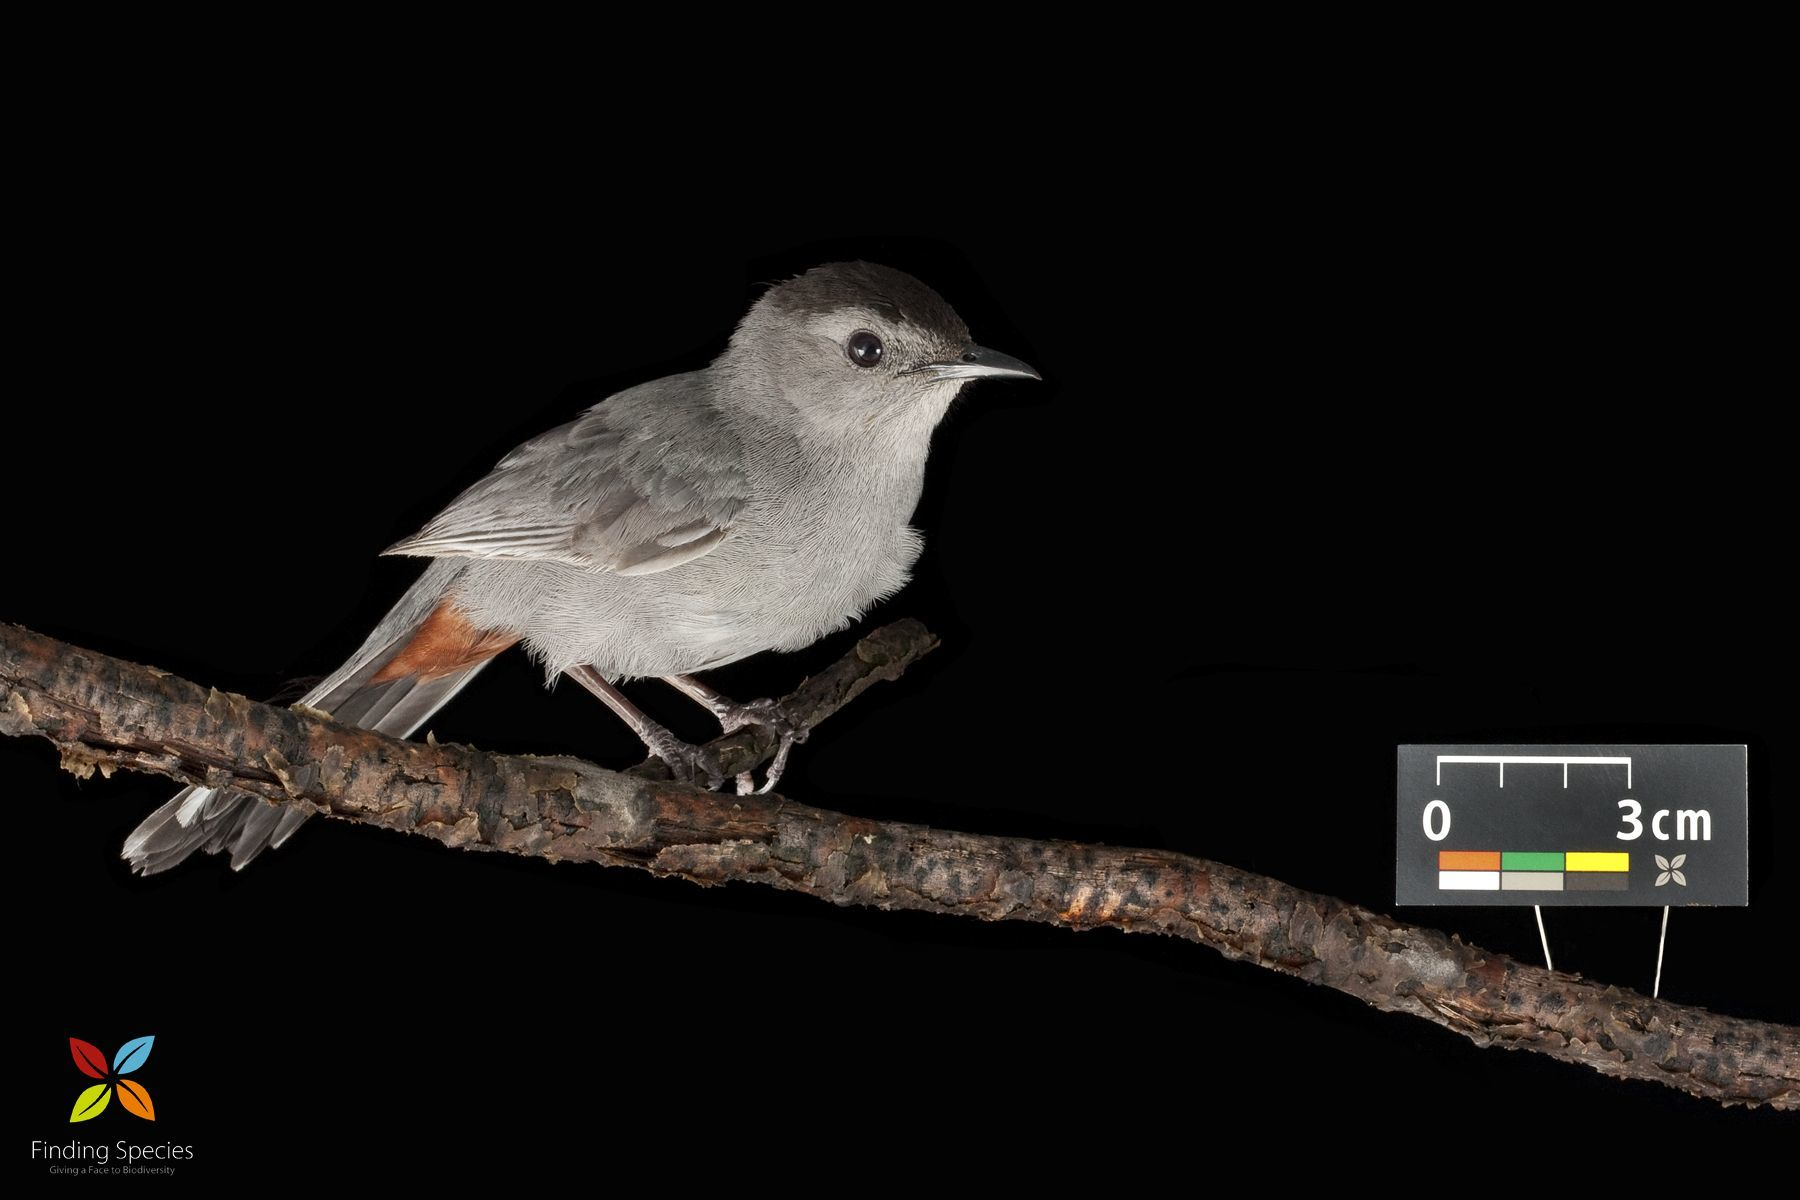 Image of Grey catbird